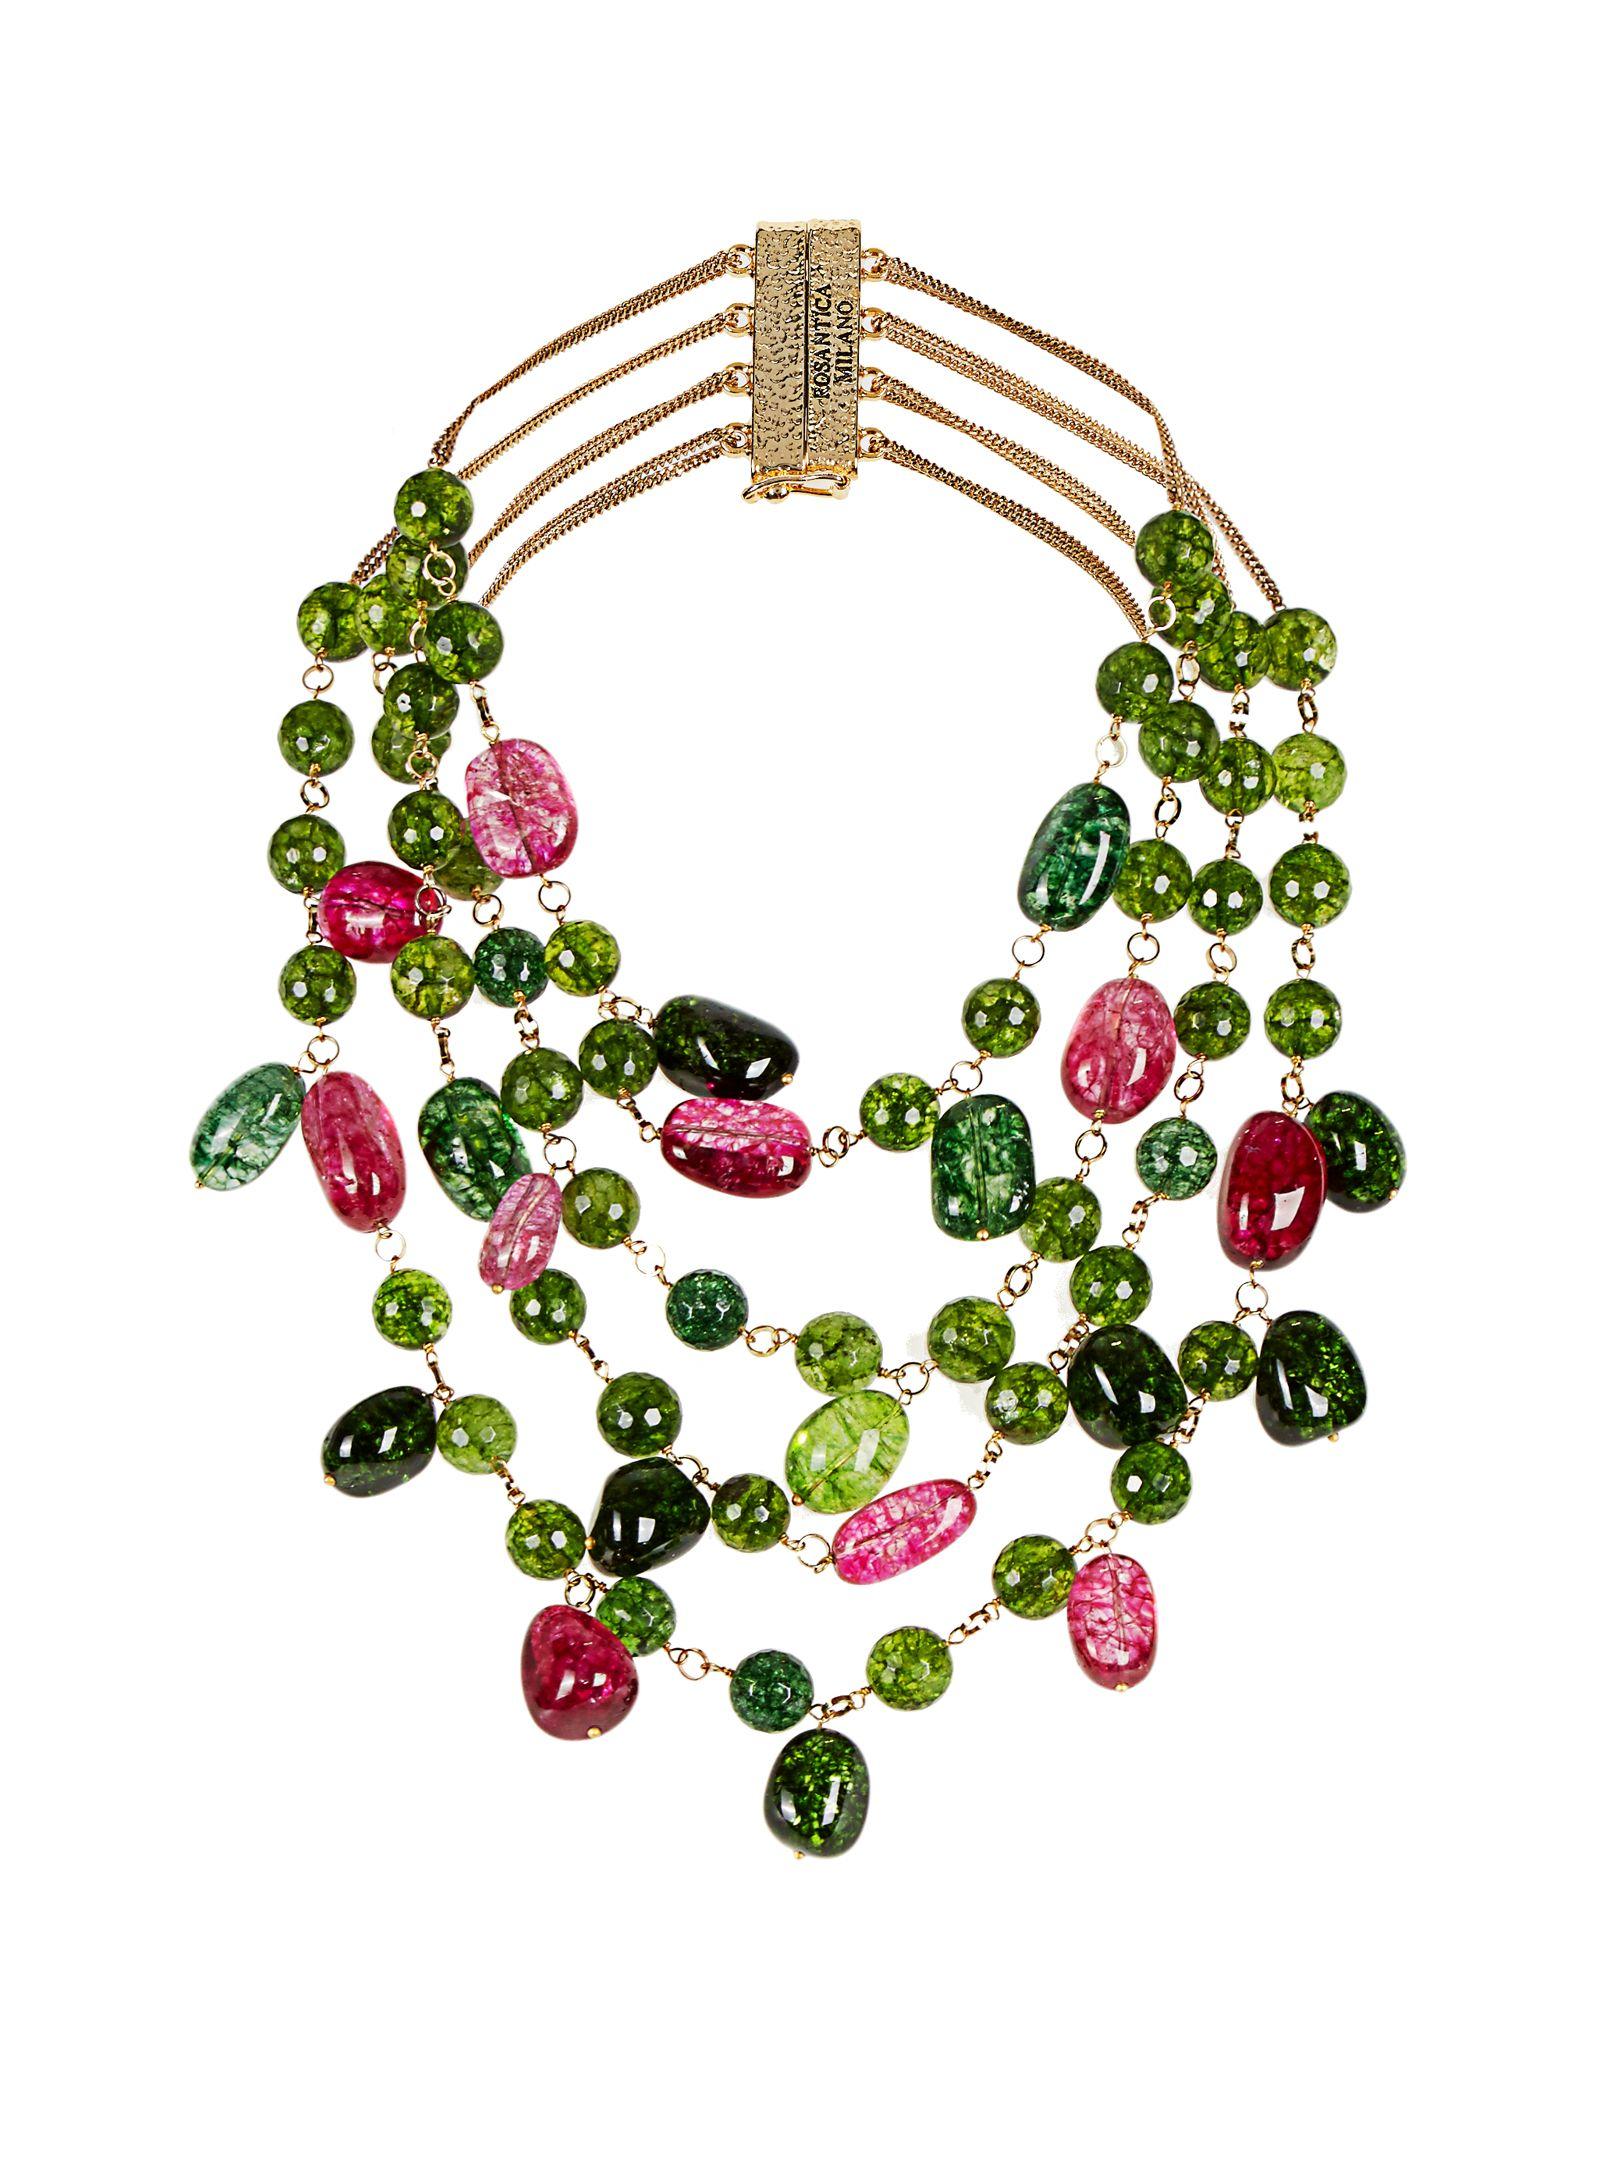 Kiwi tourmaline and agate necklace | Rosantica By Michela Panero | MATCHESFASHION.COM UK